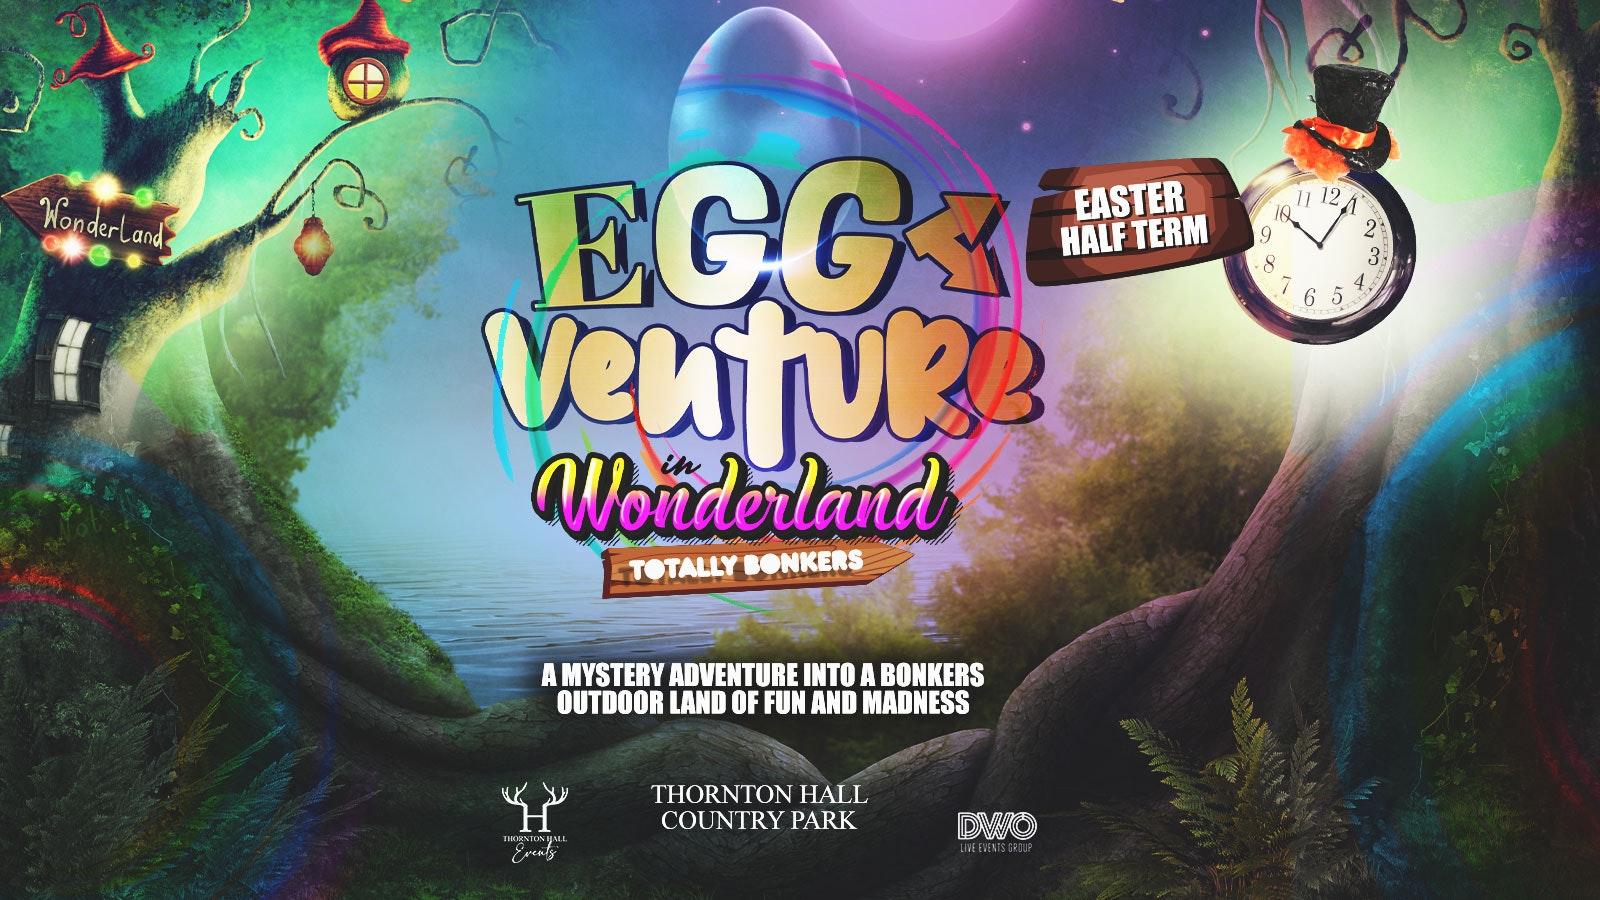 EggVenture in Wonderland – Monday 29th March – 2.30pm